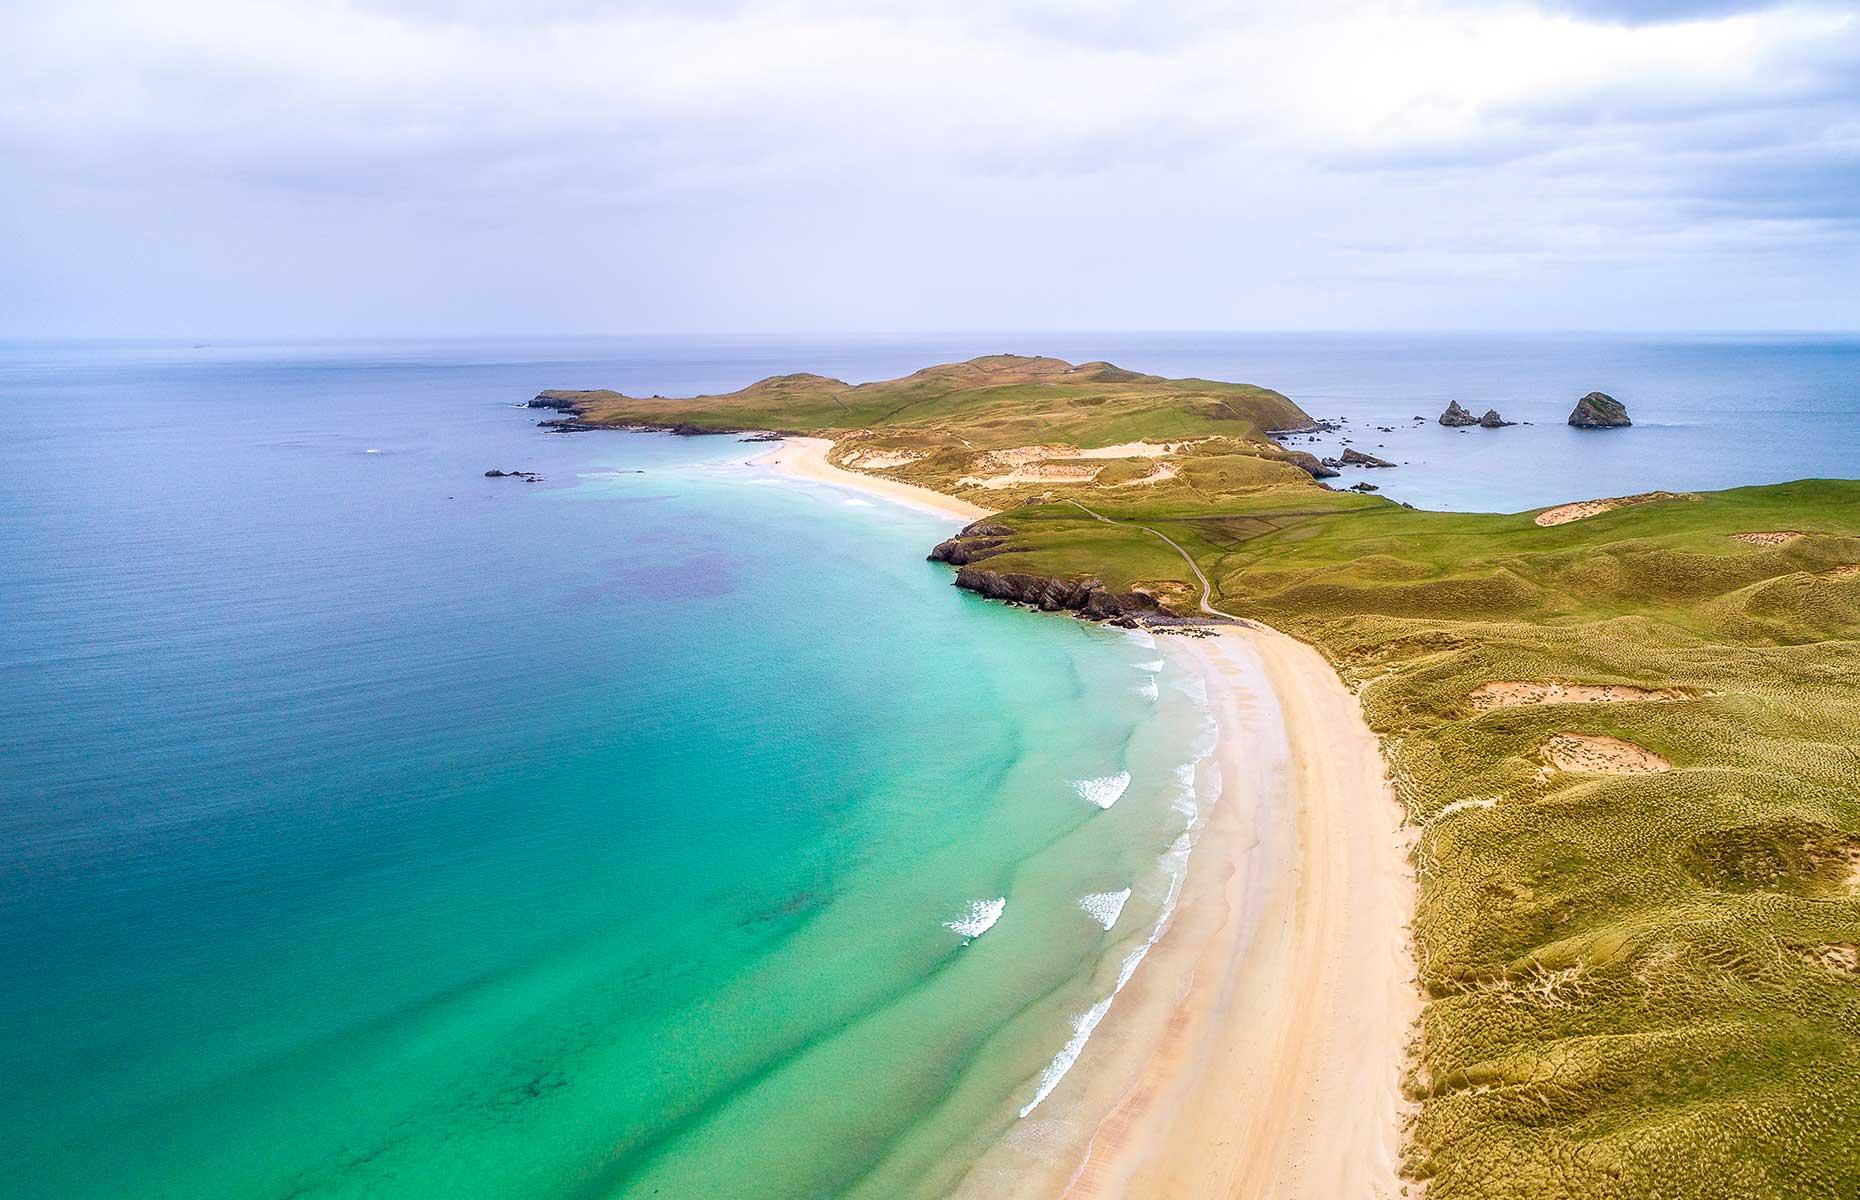 Balnakeil beach, Scotland (Image: rphstock/Shutterstock)